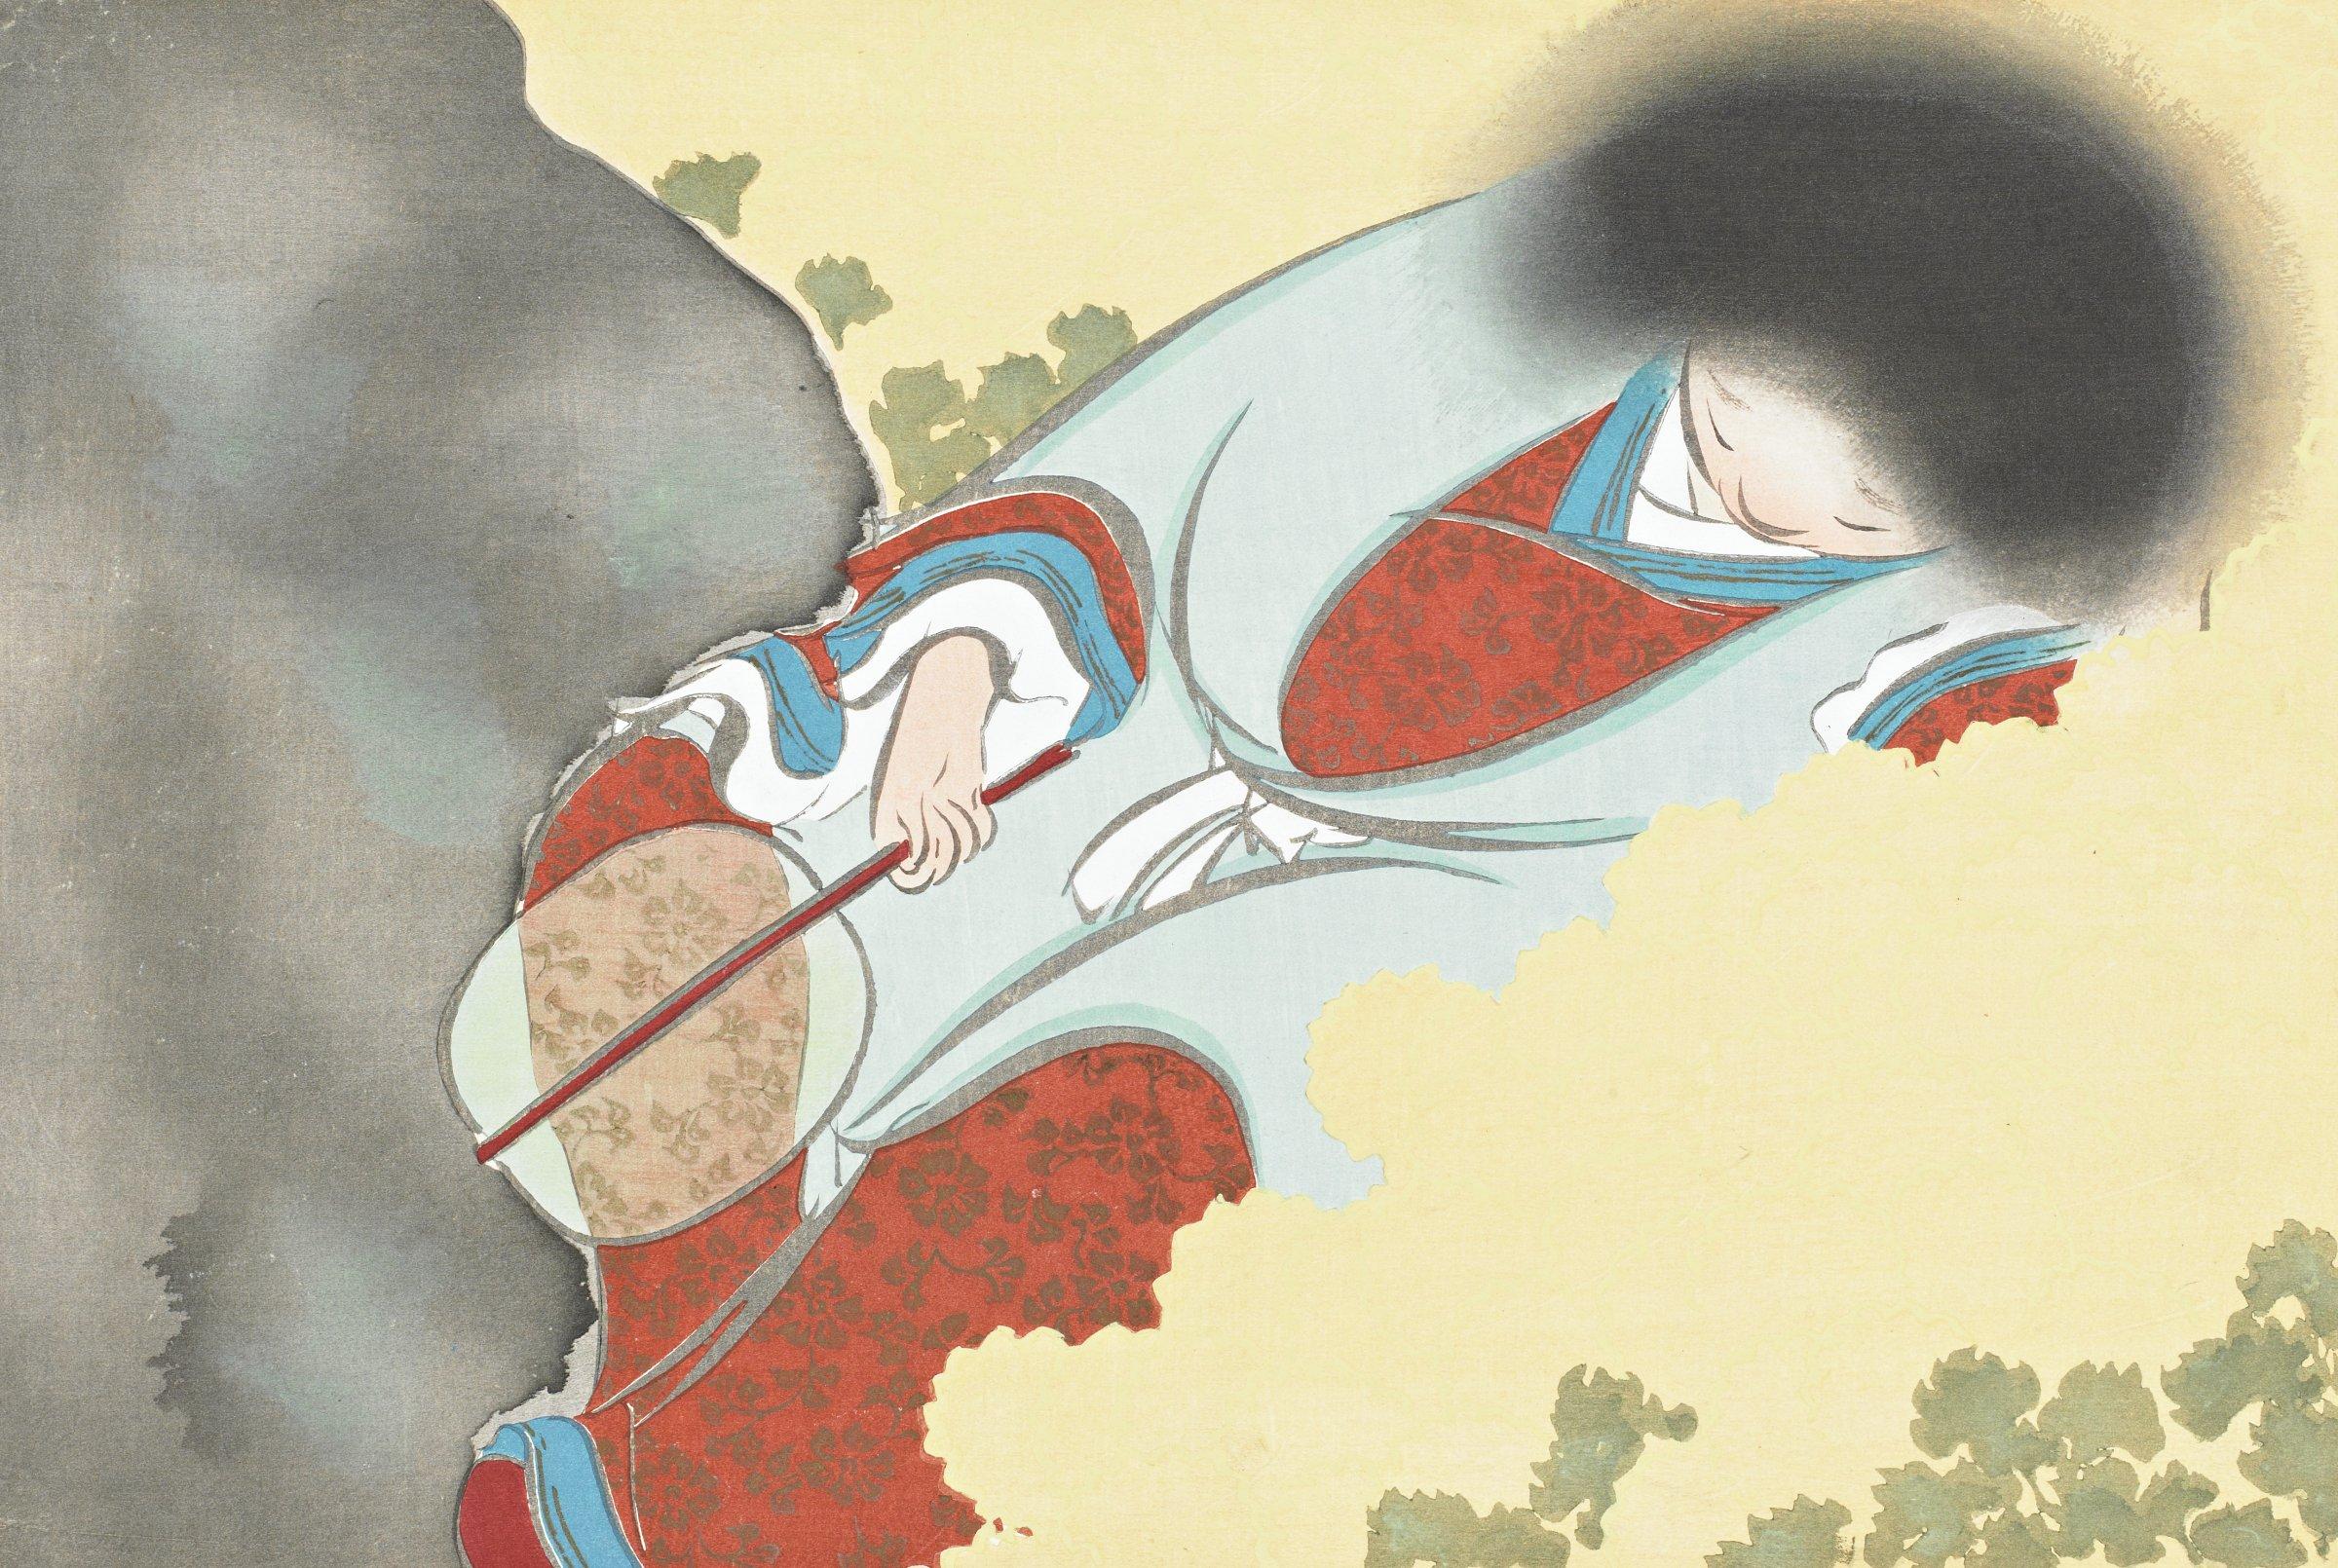 Kikujido (A Noh Play), from Momoyogusa (A World of Things), Volume 2, Kamisaka Sekka, ink and color on paper